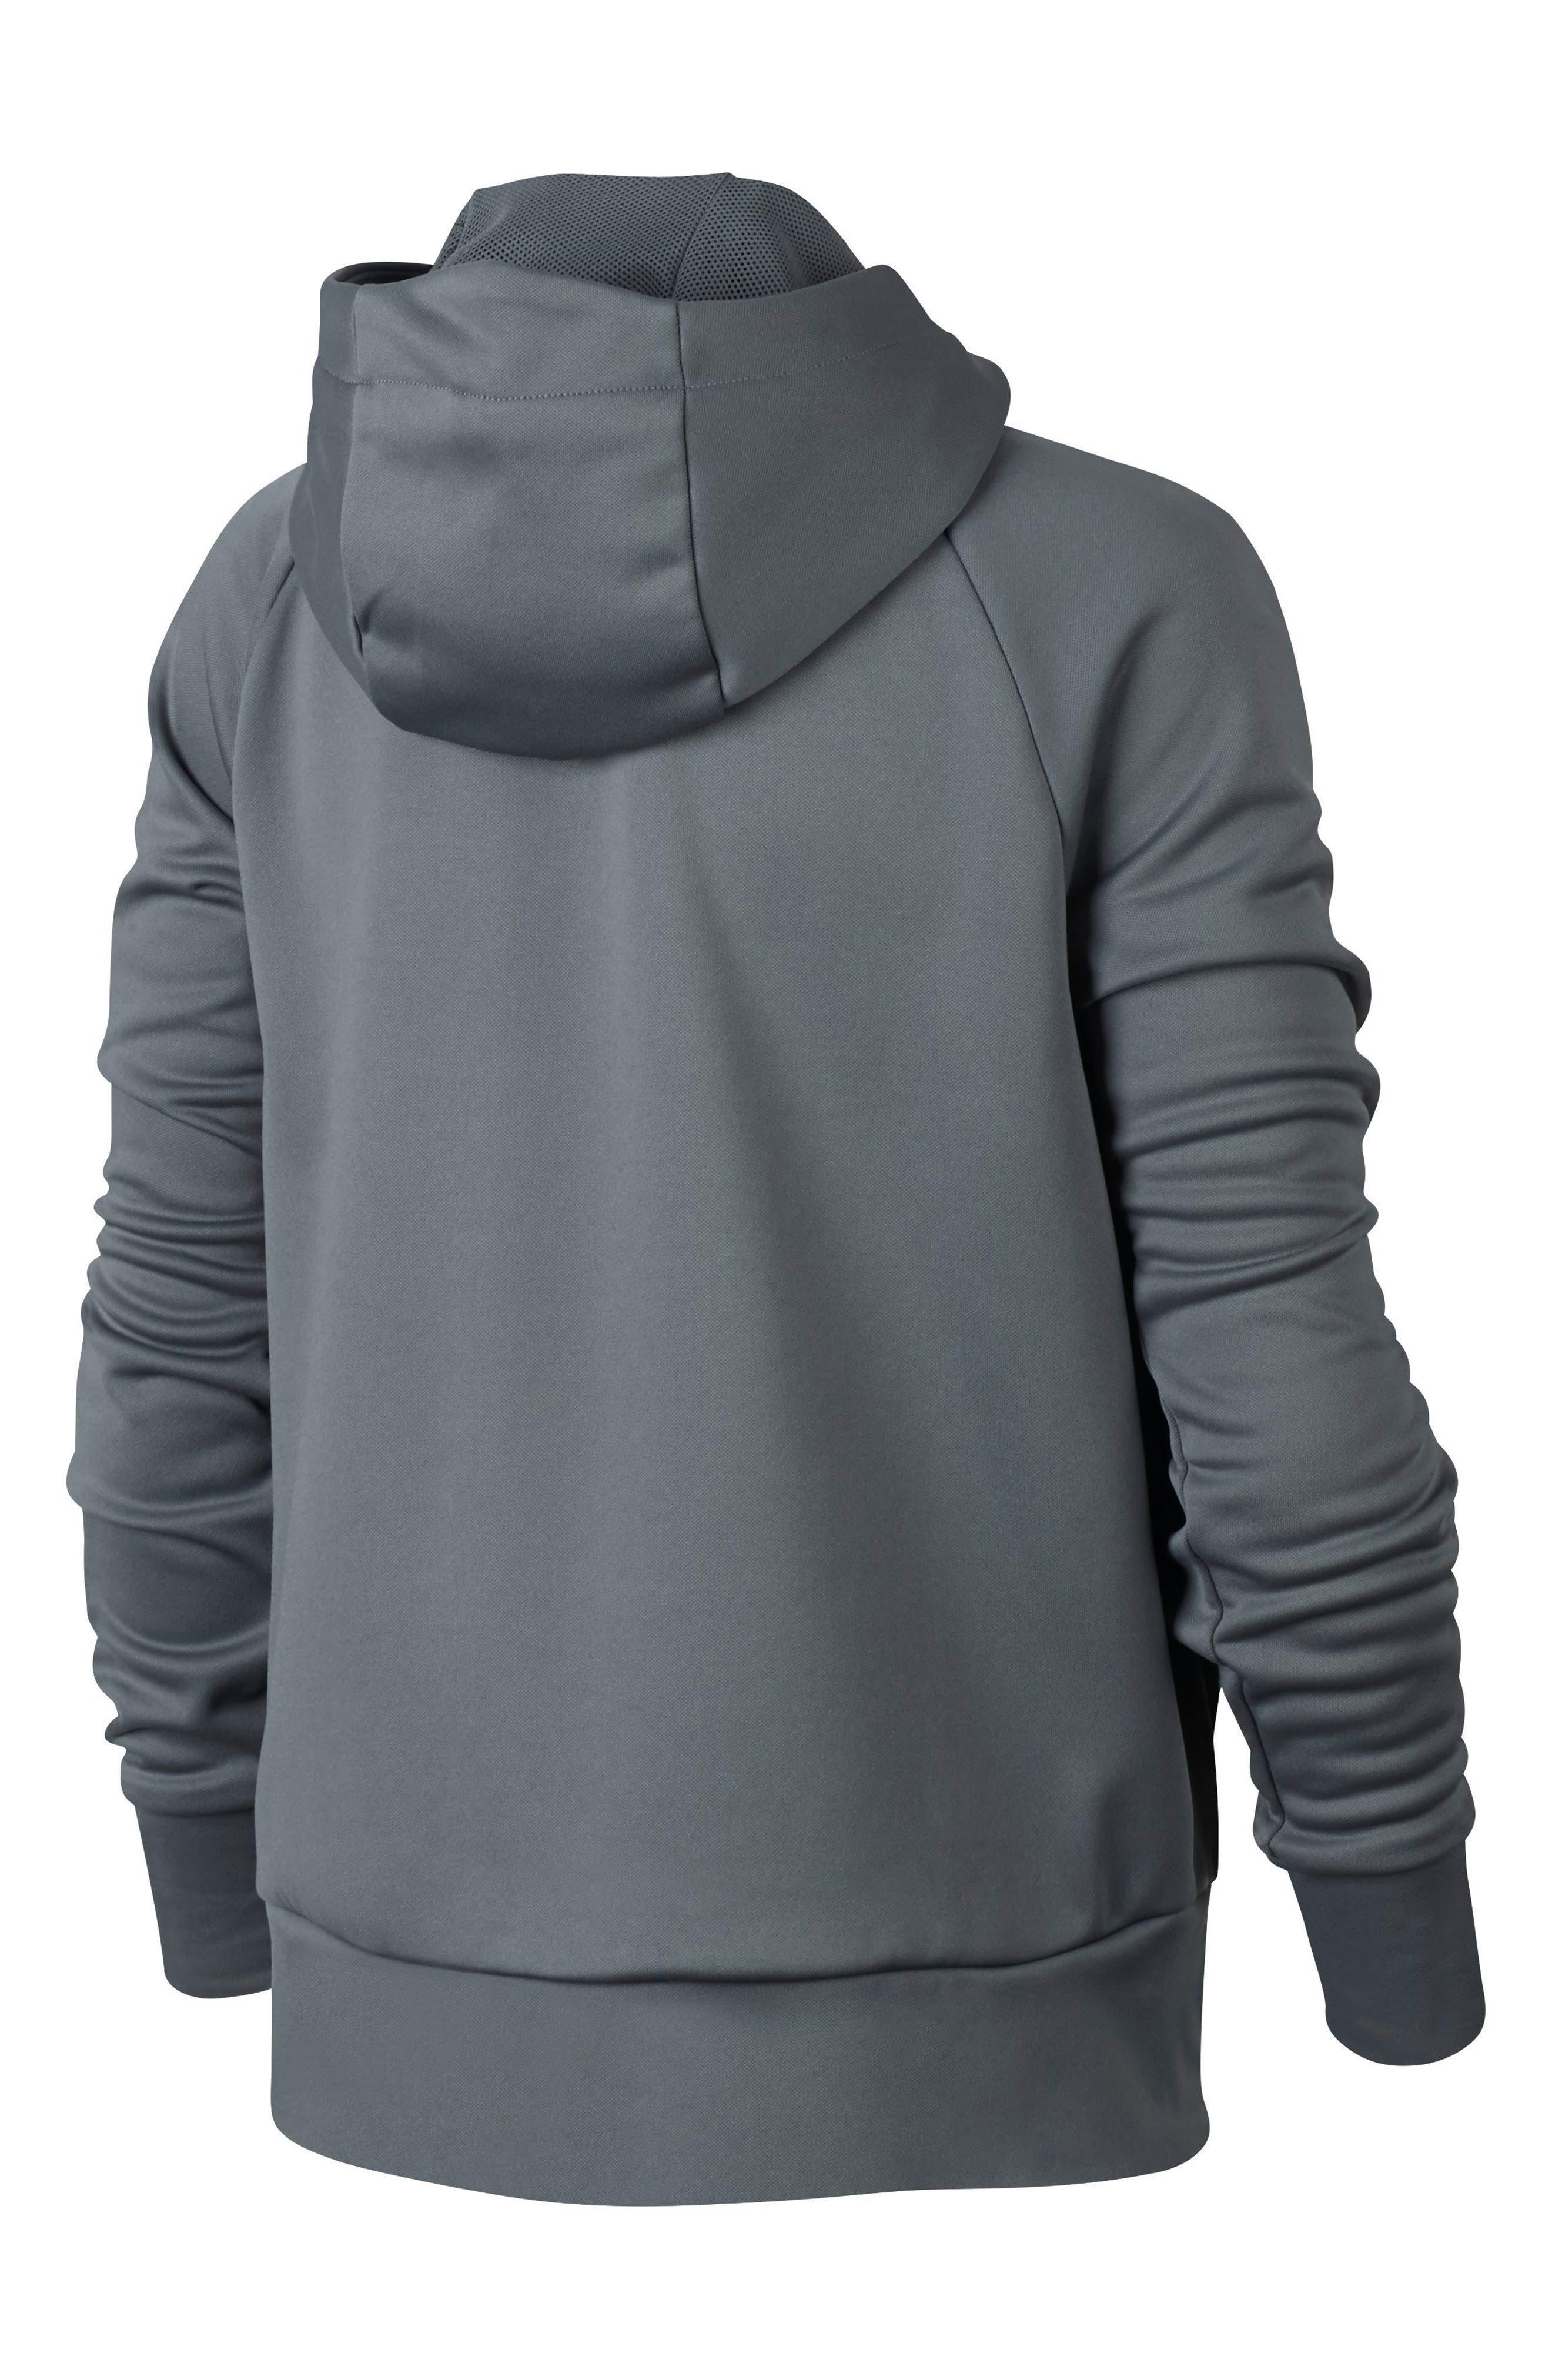 Therma Dry Hoodie,                             Alternate thumbnail 2, color,                             Grey